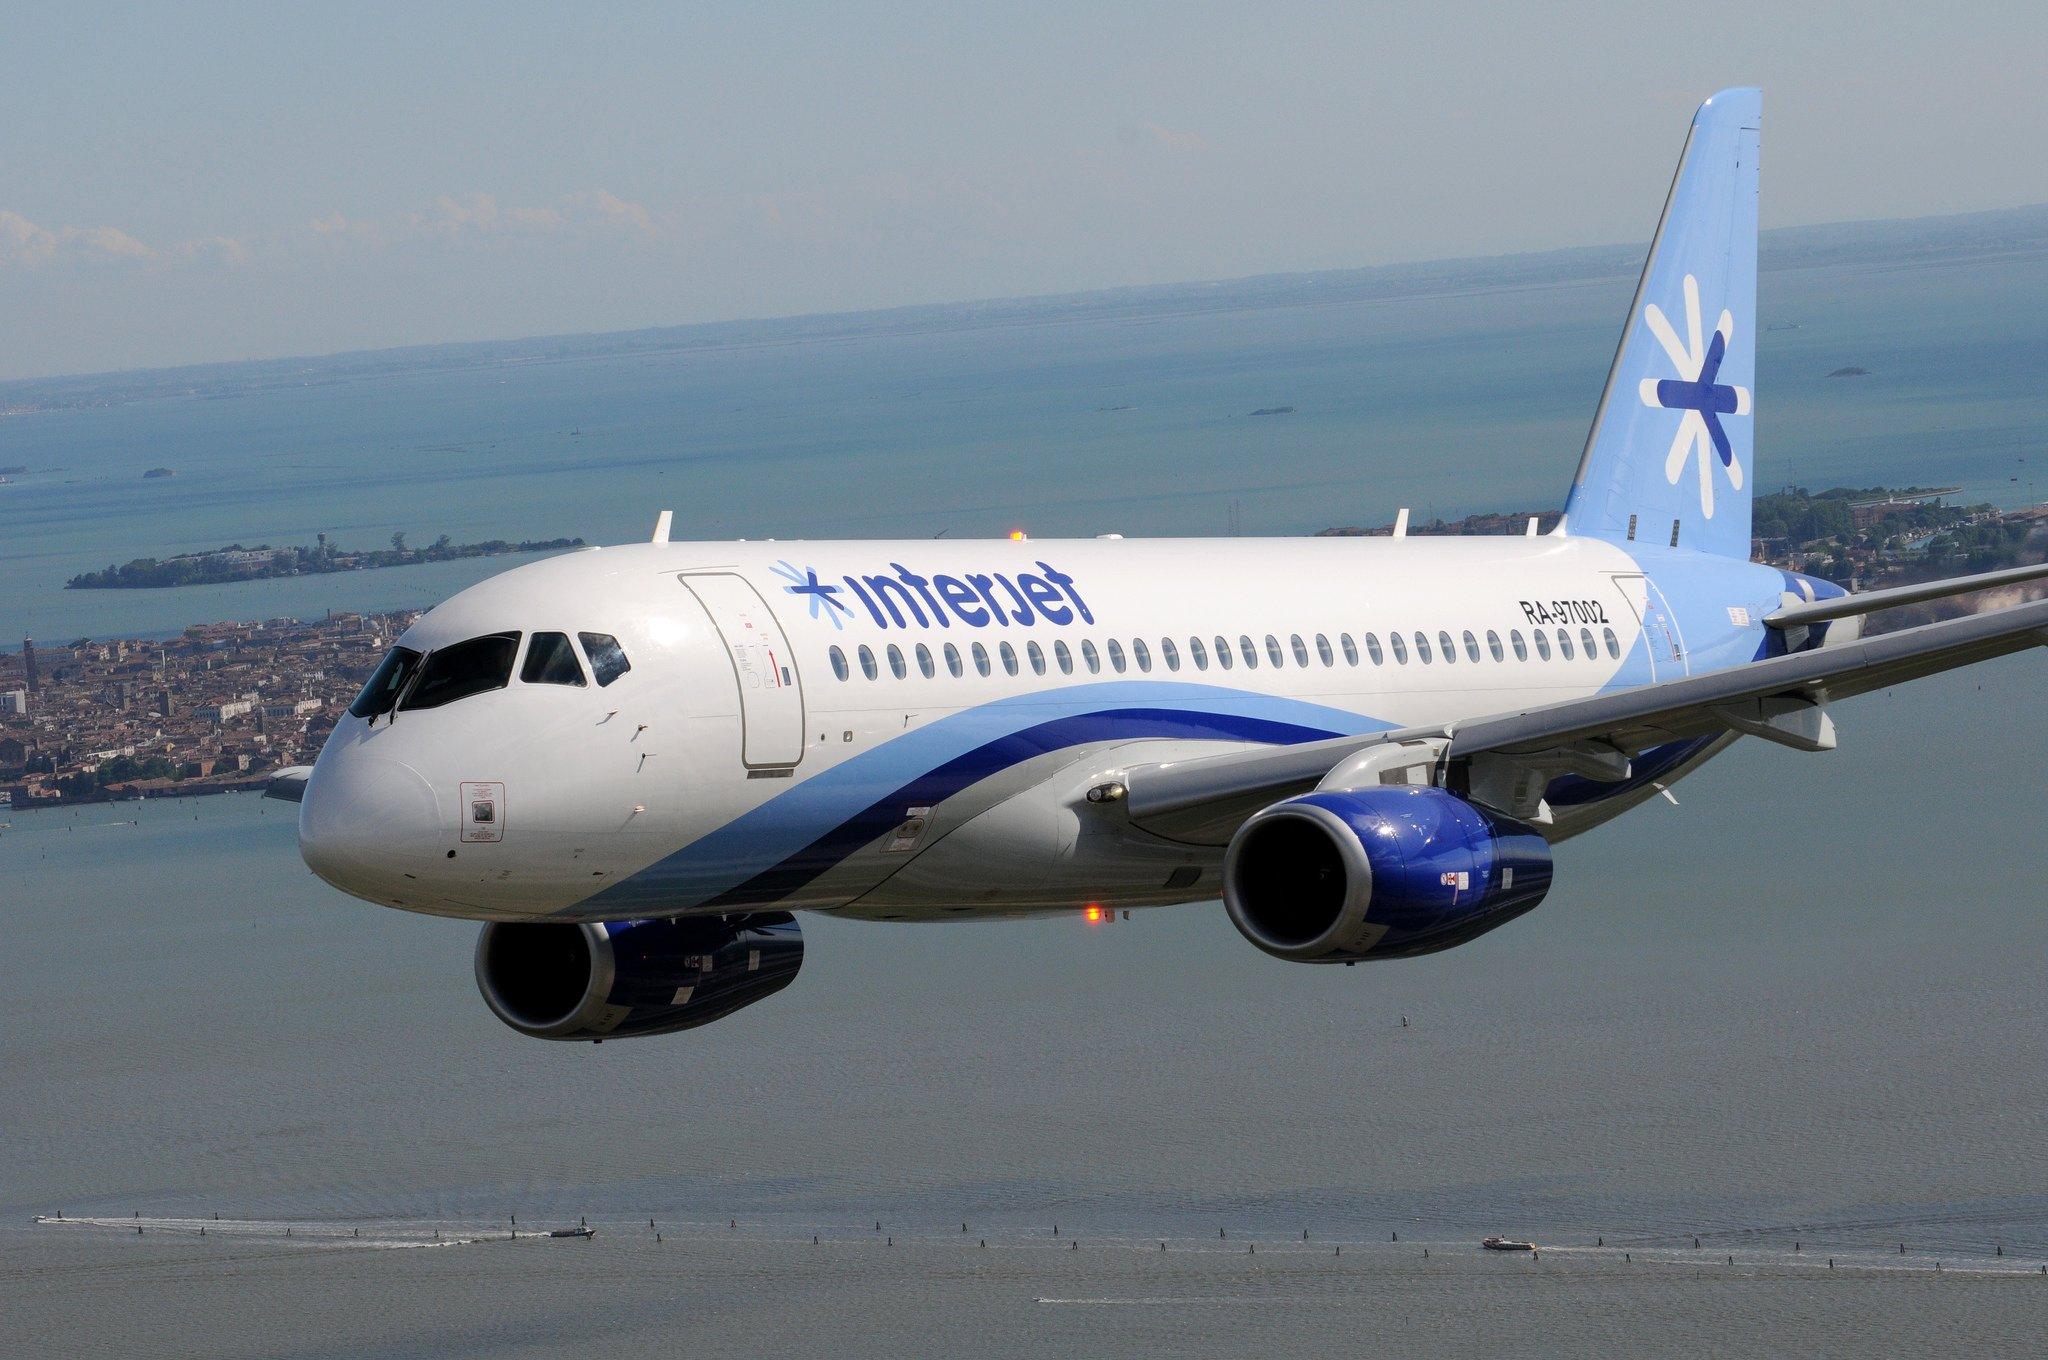 SSJ100 for Interjet par SuperJet International sous (CC BY-SA 2.0) https://www.flickr.com/photos/superjetinternational/9016198170/ https://creativecommons.org/licenses/by-sa/2.0/